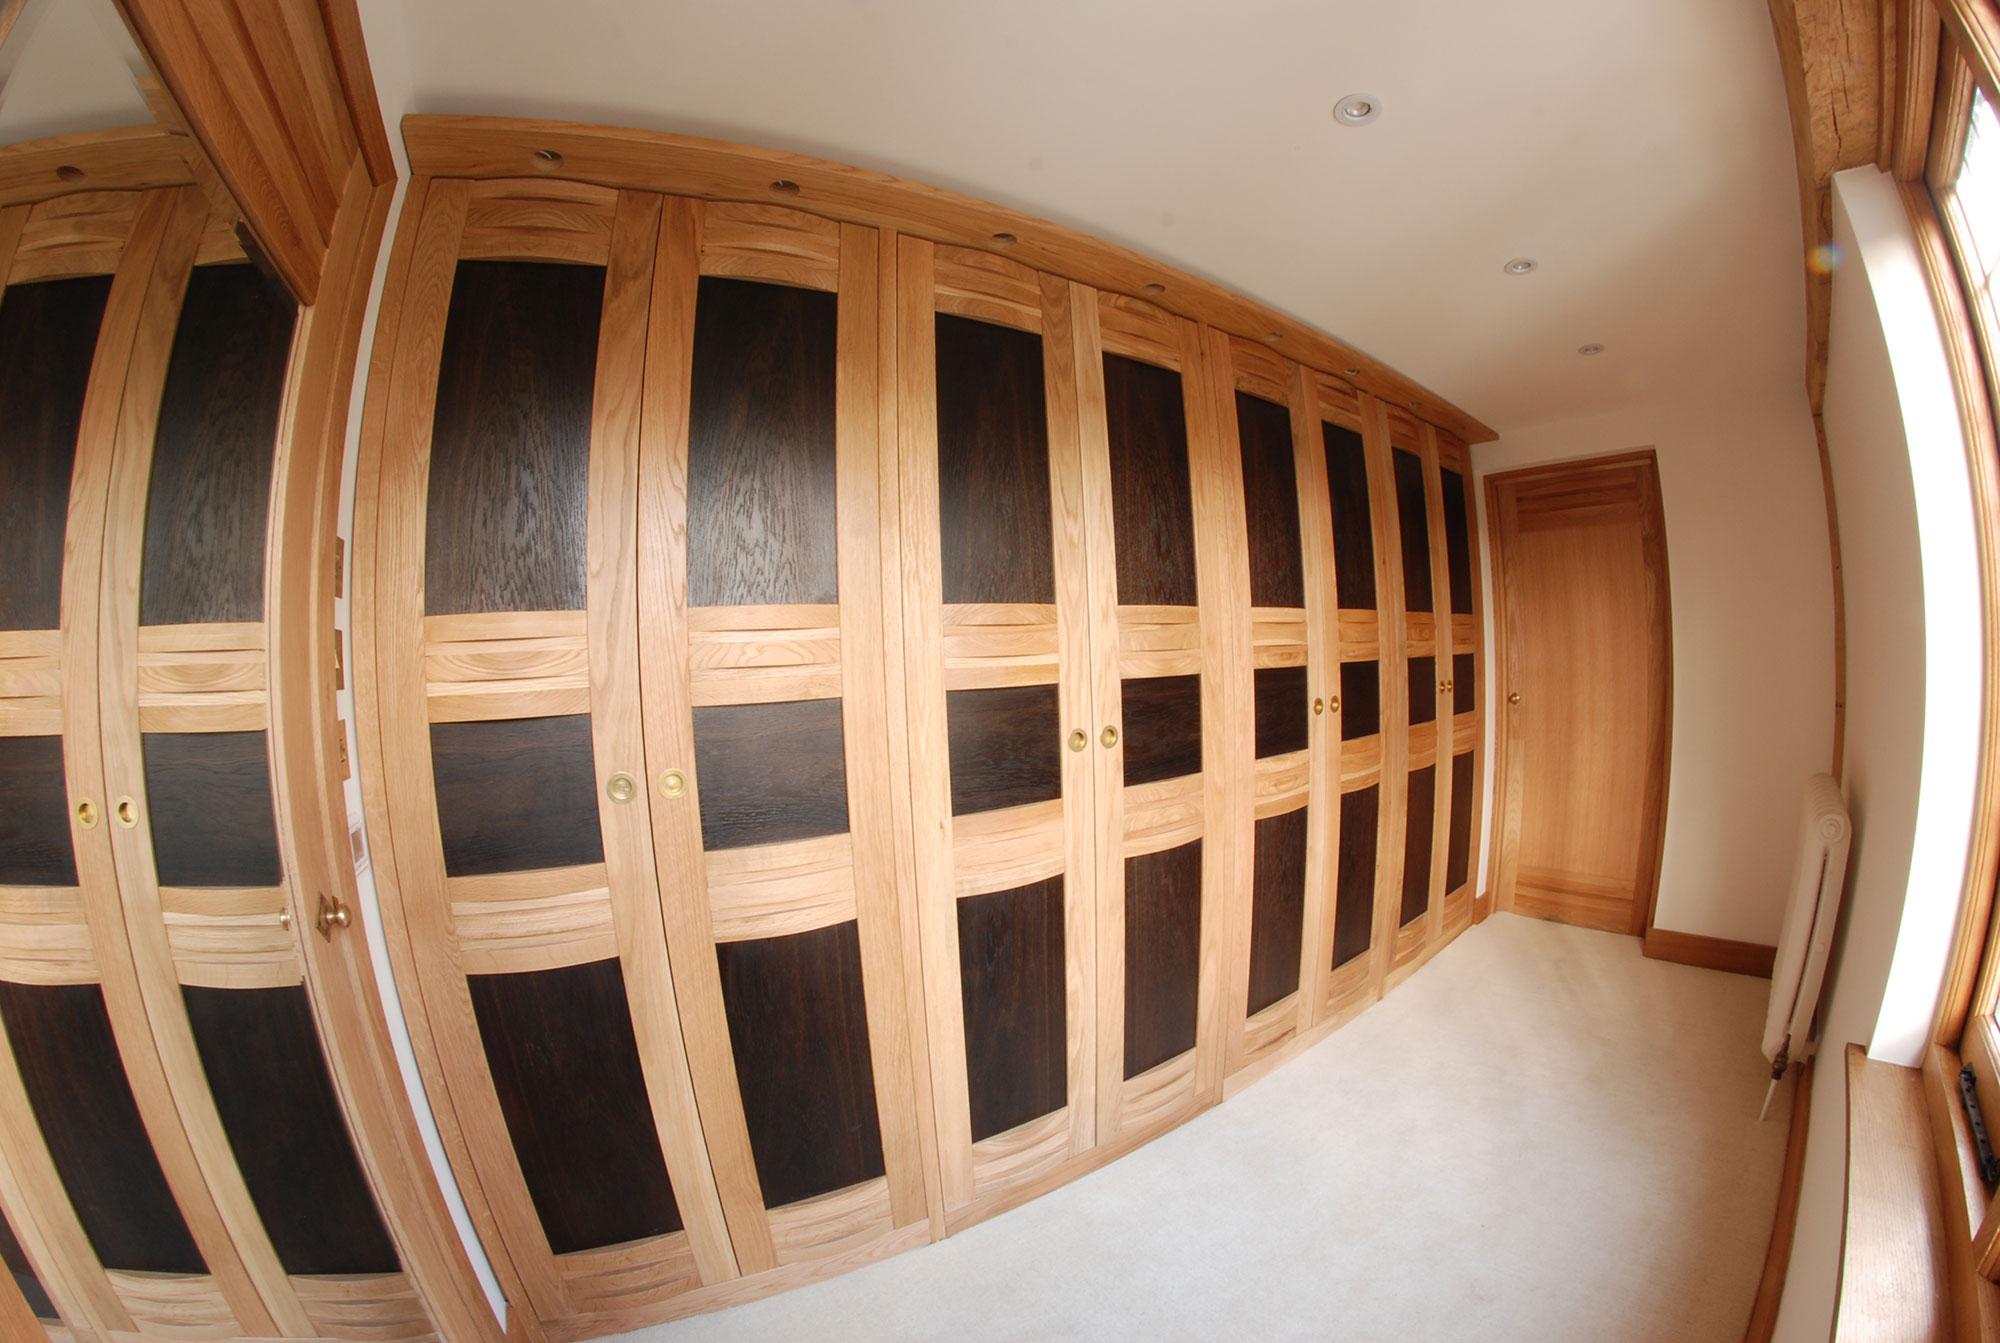 Fitted Wardrobes - 'Fumed Oak'